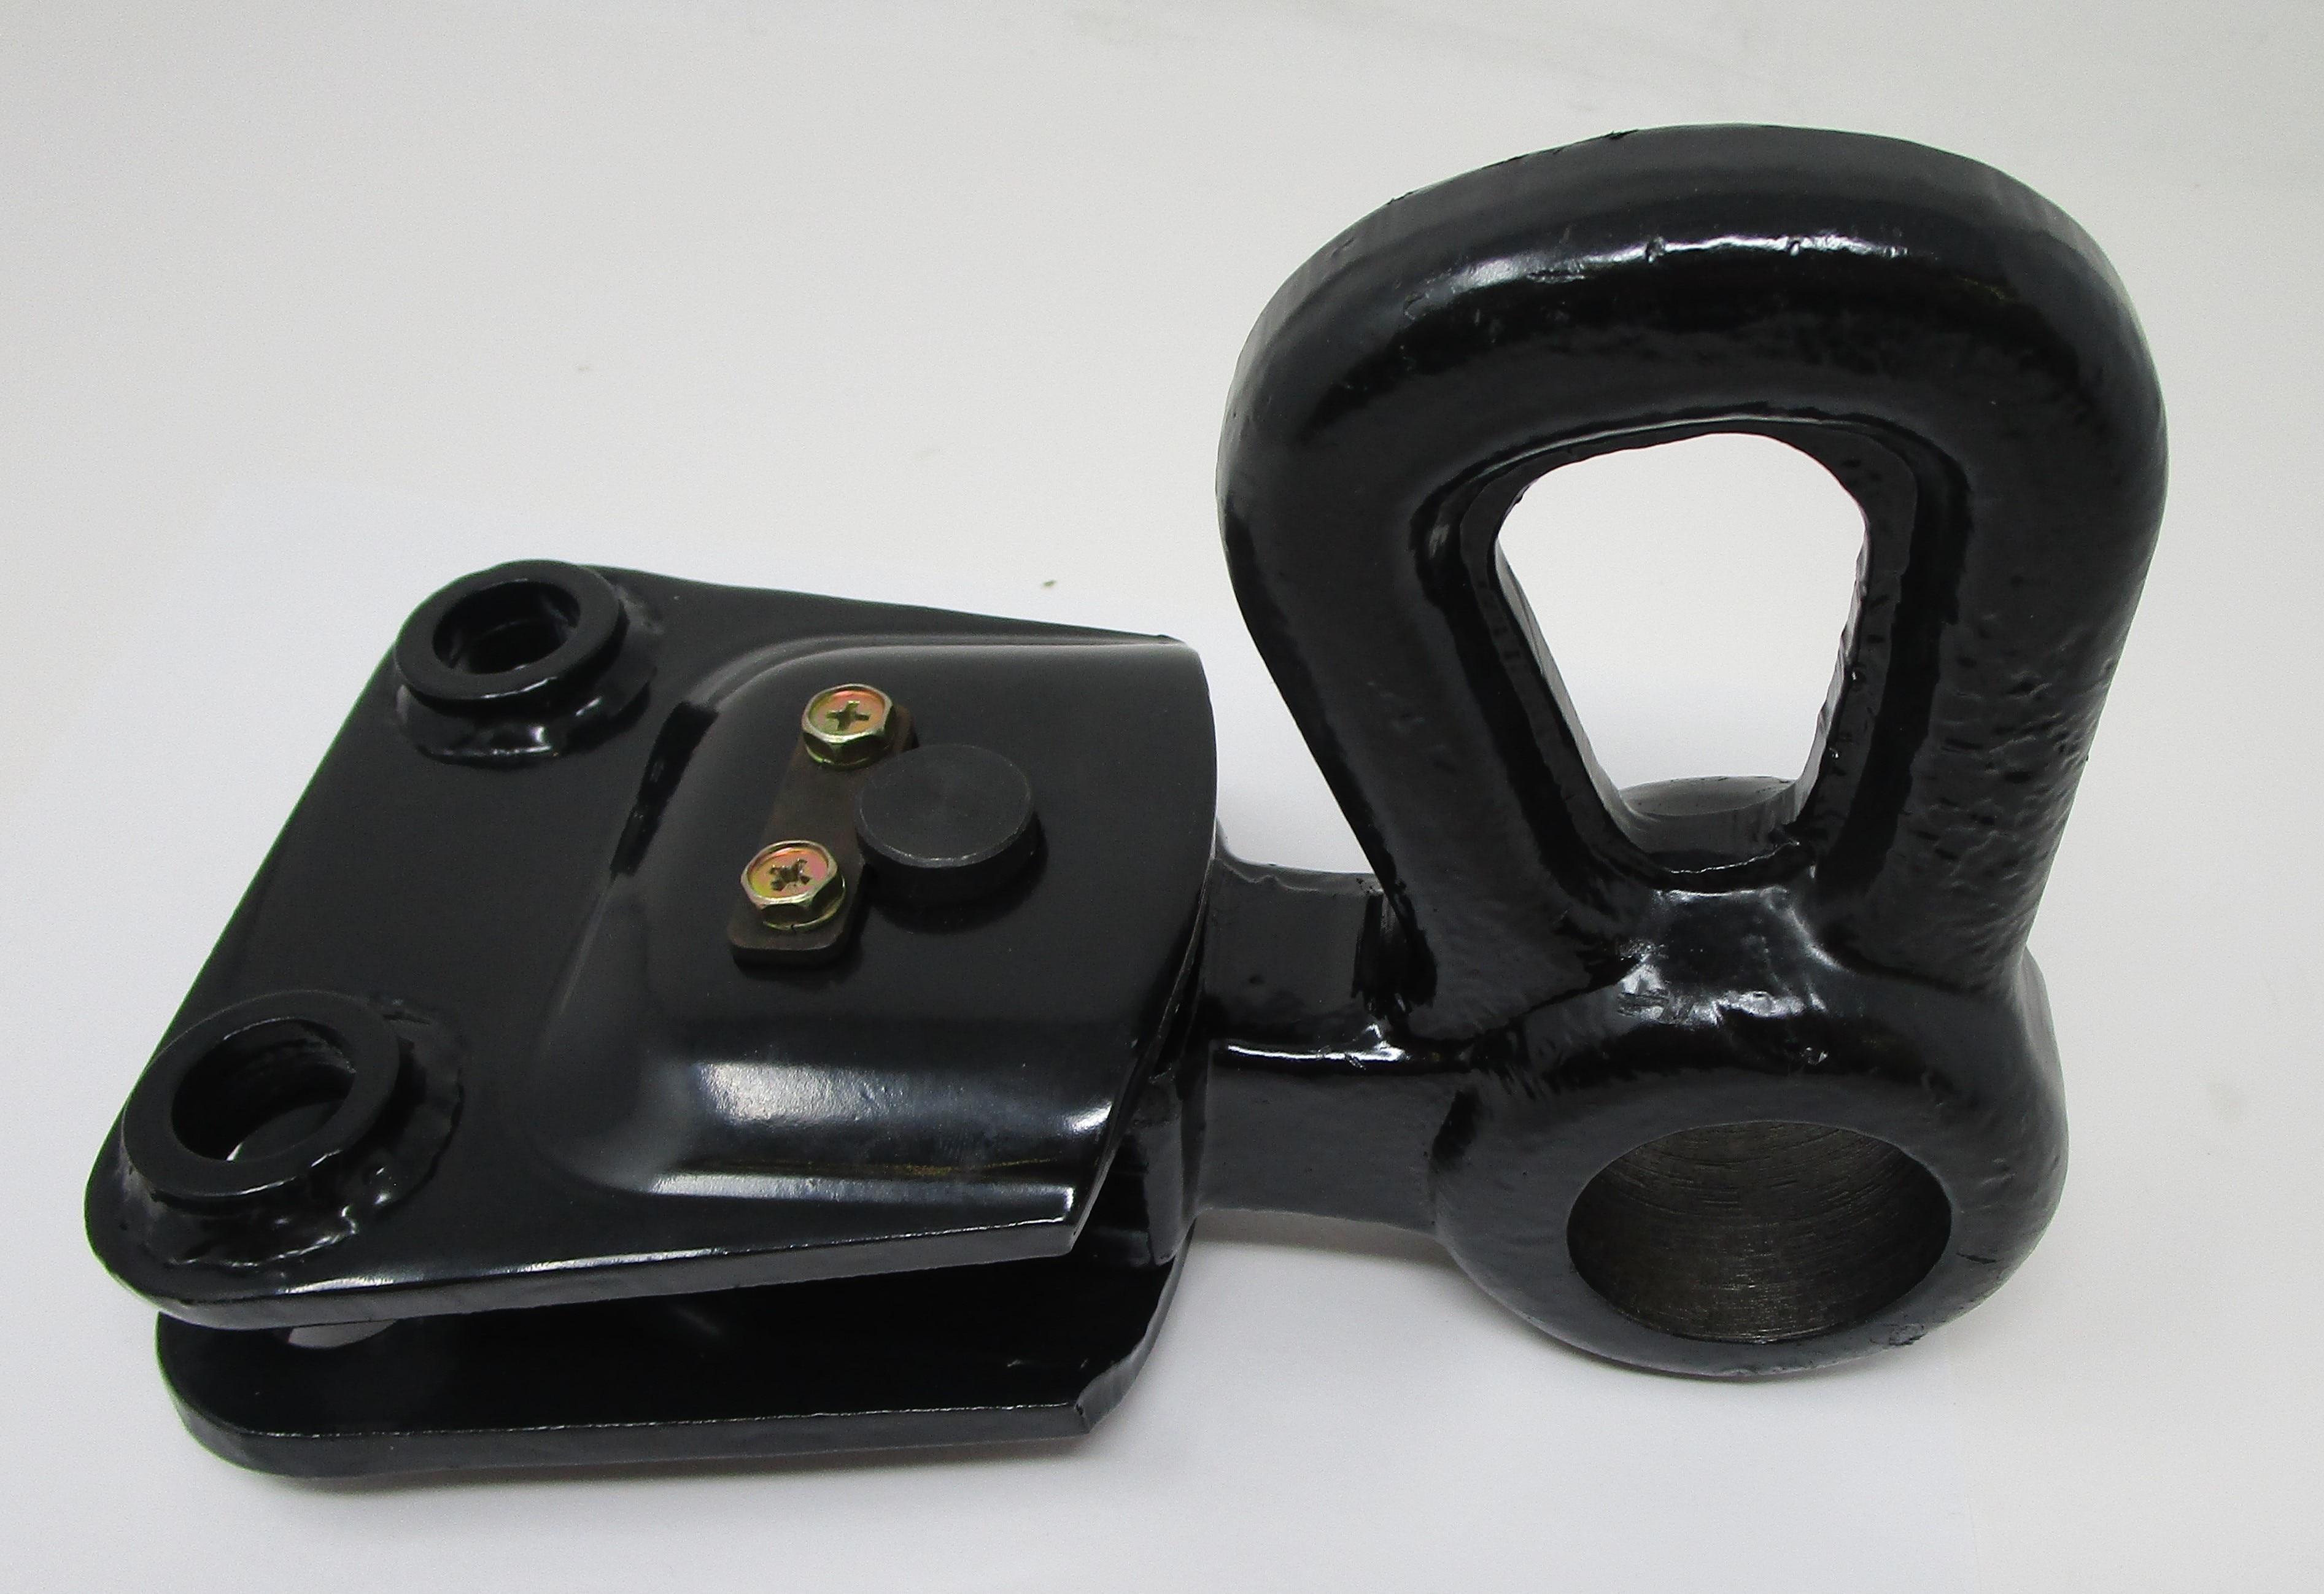 3-Ton Lug Mount Assembly For Electric Hoist